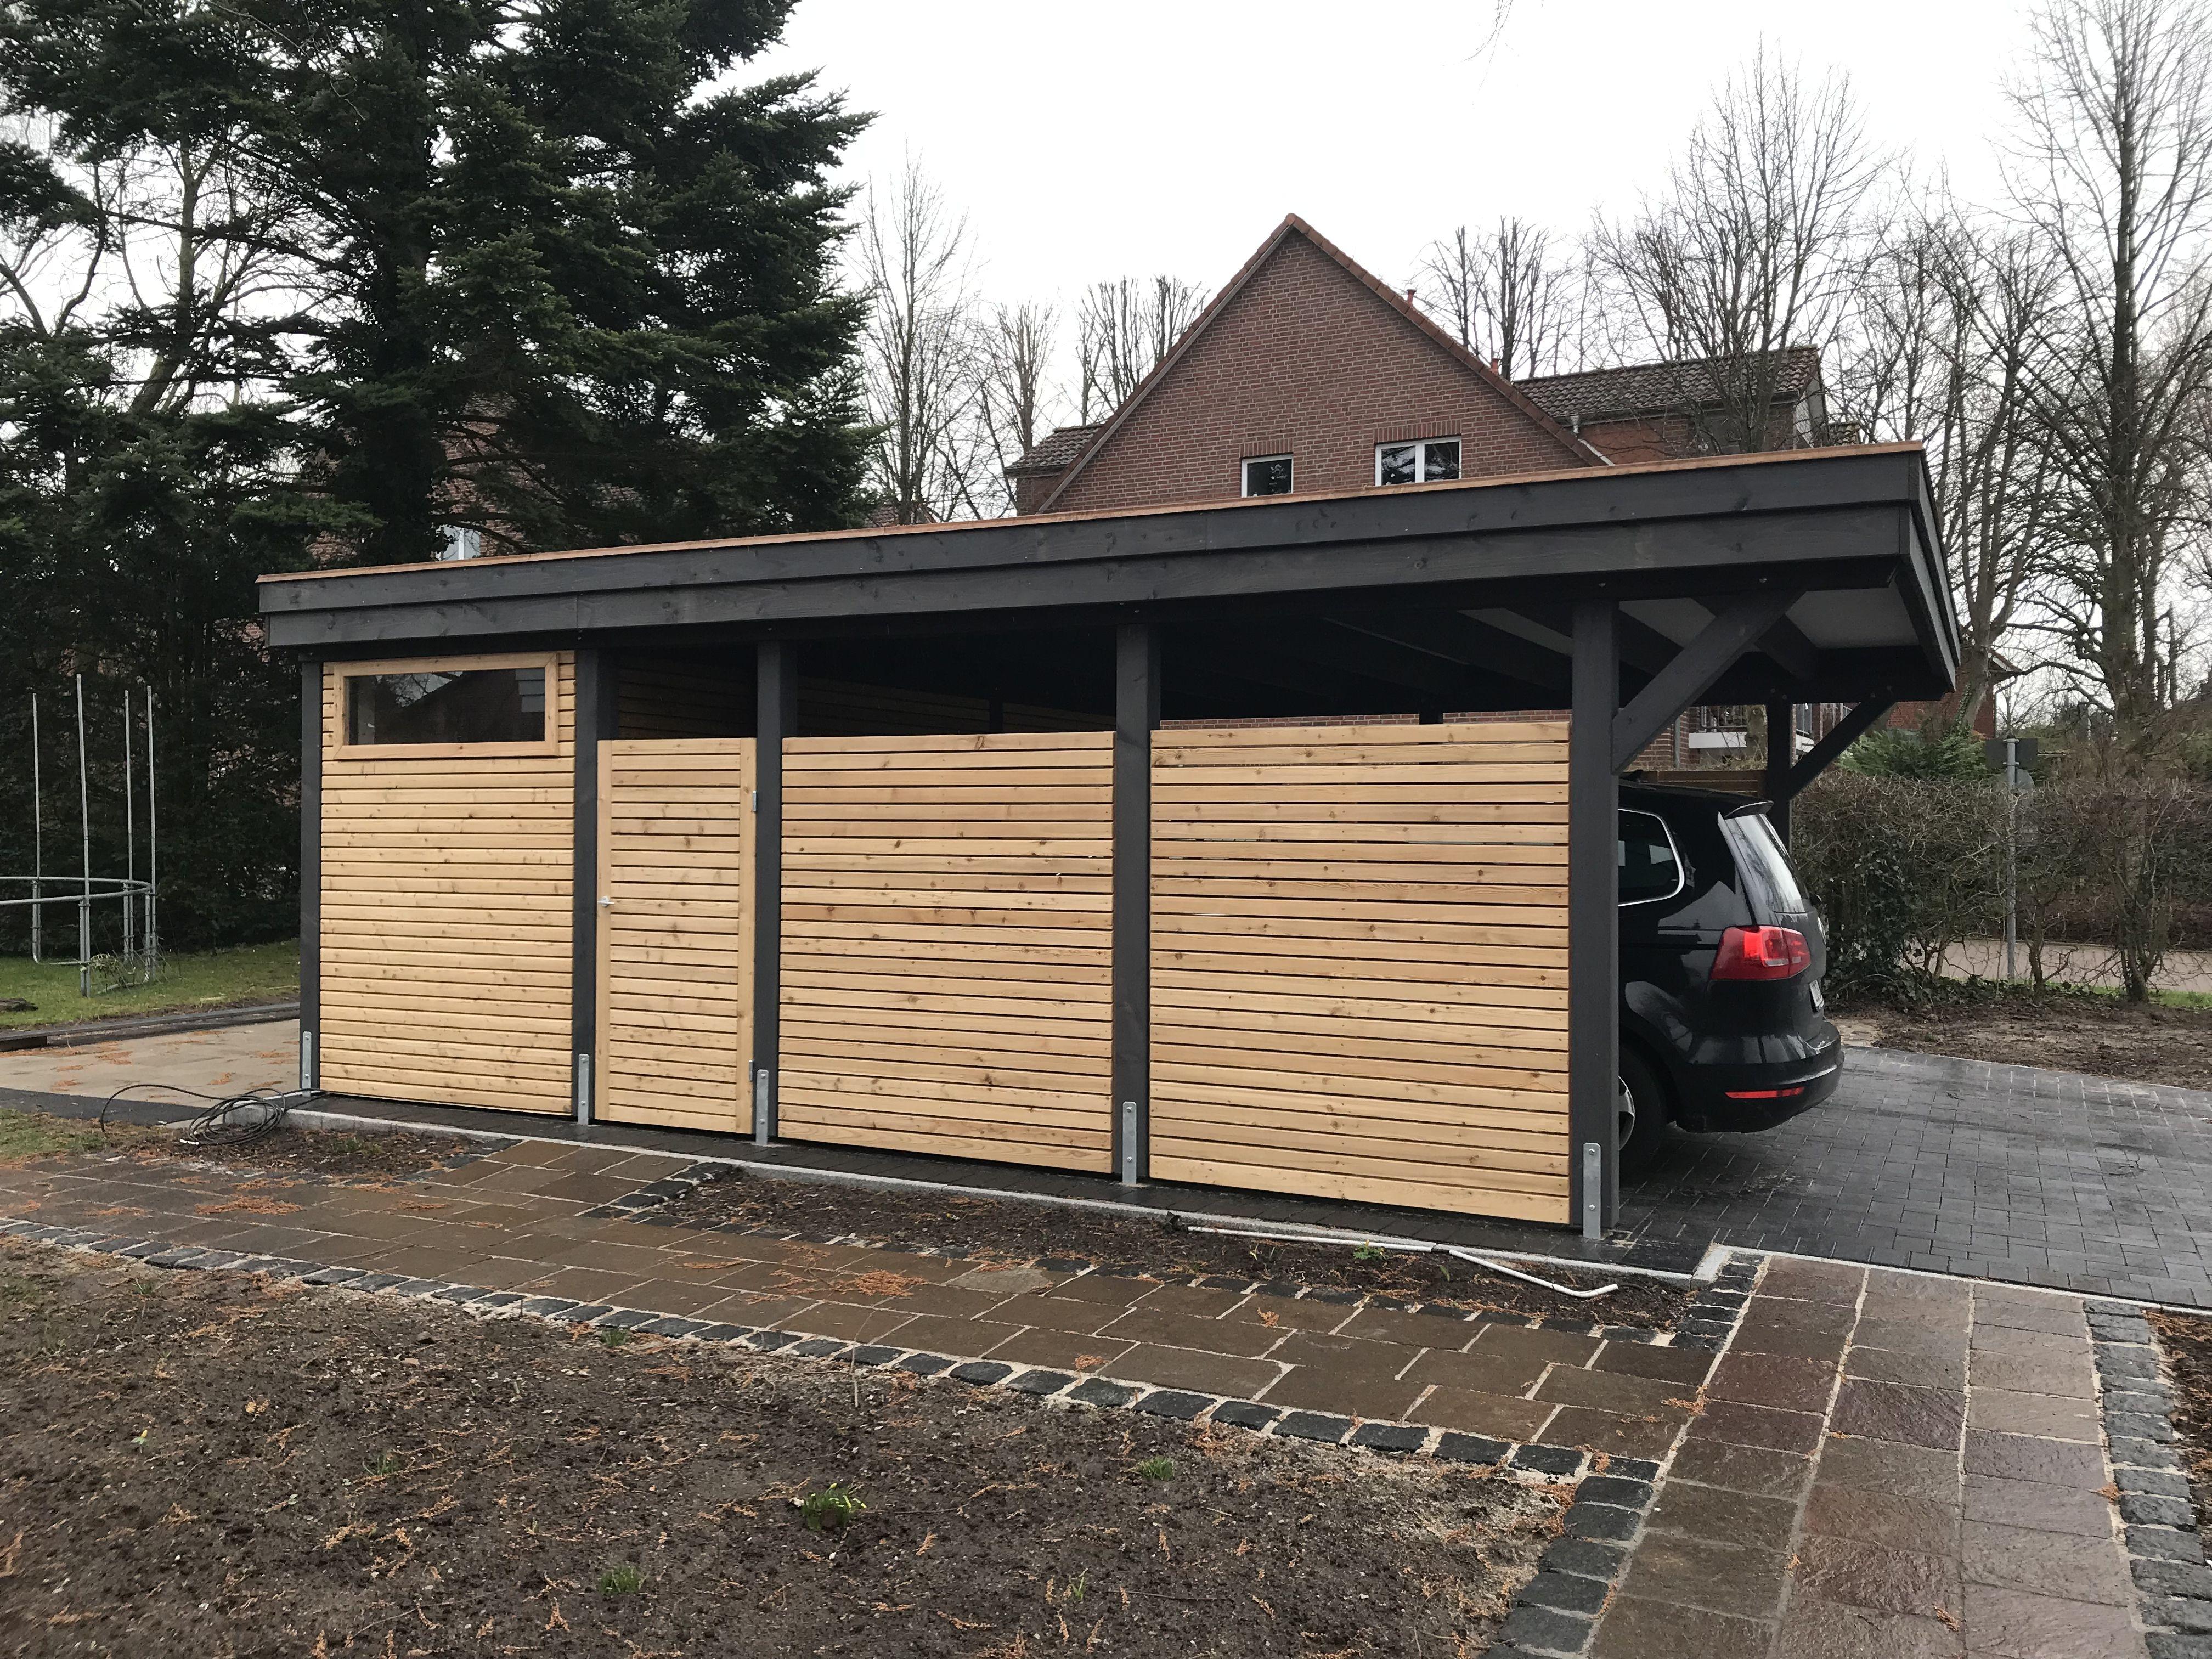 Holz Carport Mit Rhombus Verkleidung Vom Holzhof Friedrichsruh Gmbh Carport Holz Carport Doppelcarport